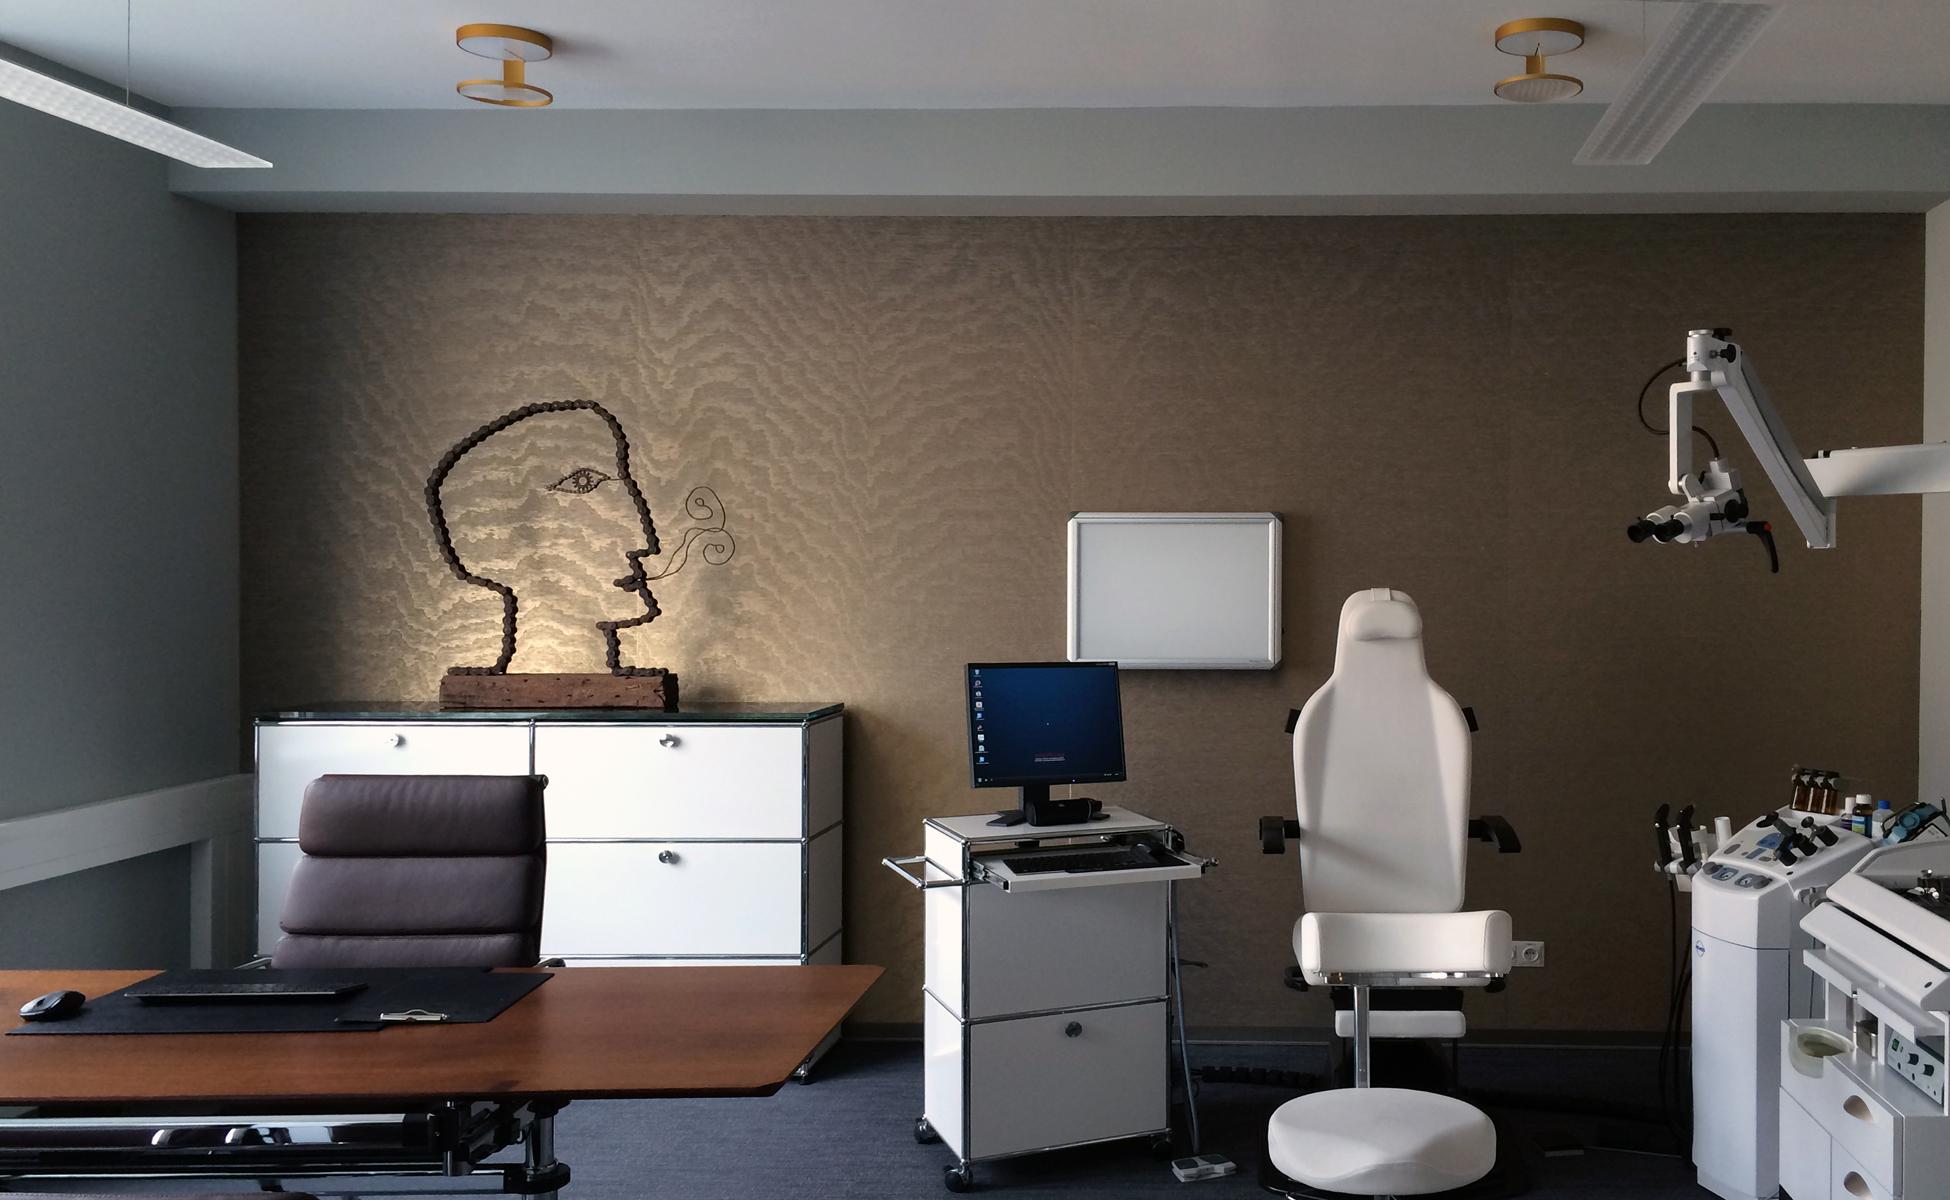 Praxis Untersuchungsraum USM Haller + Vitra Soft Pad Chair + Nimbus bei steidten+ Berlin